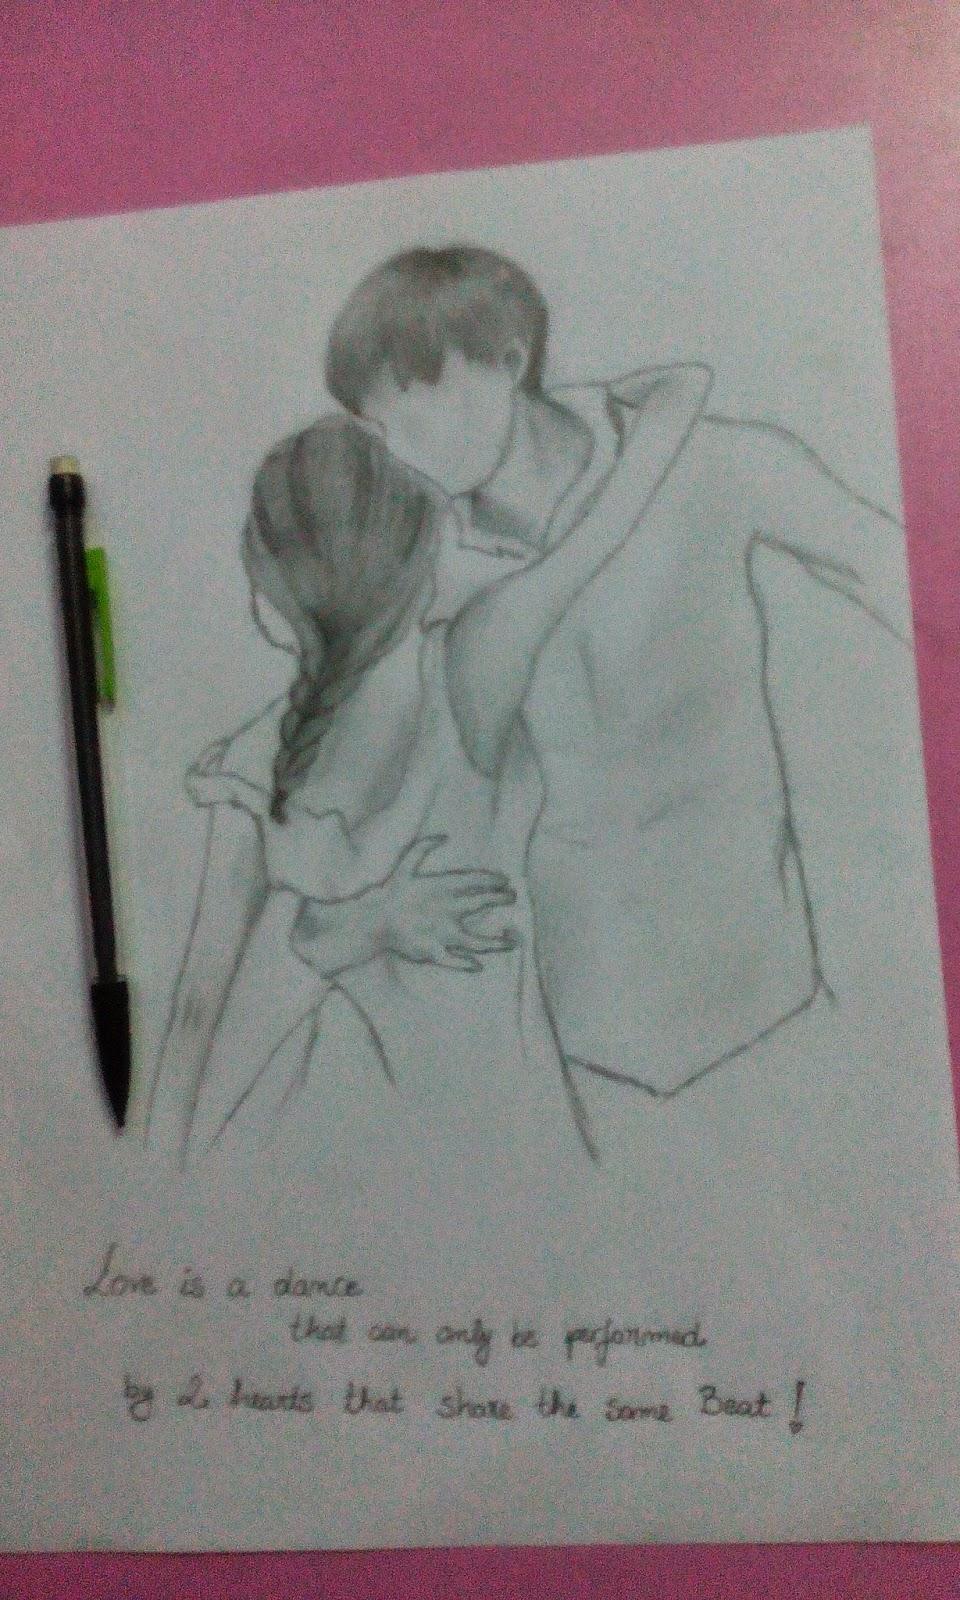 http://4.bp.blogspot.com/-PGiKe5wJmBc/VFZMV5suMmI/AAAAAAAABjw/mge1rm7vQWU/s1600/drawings.jpg